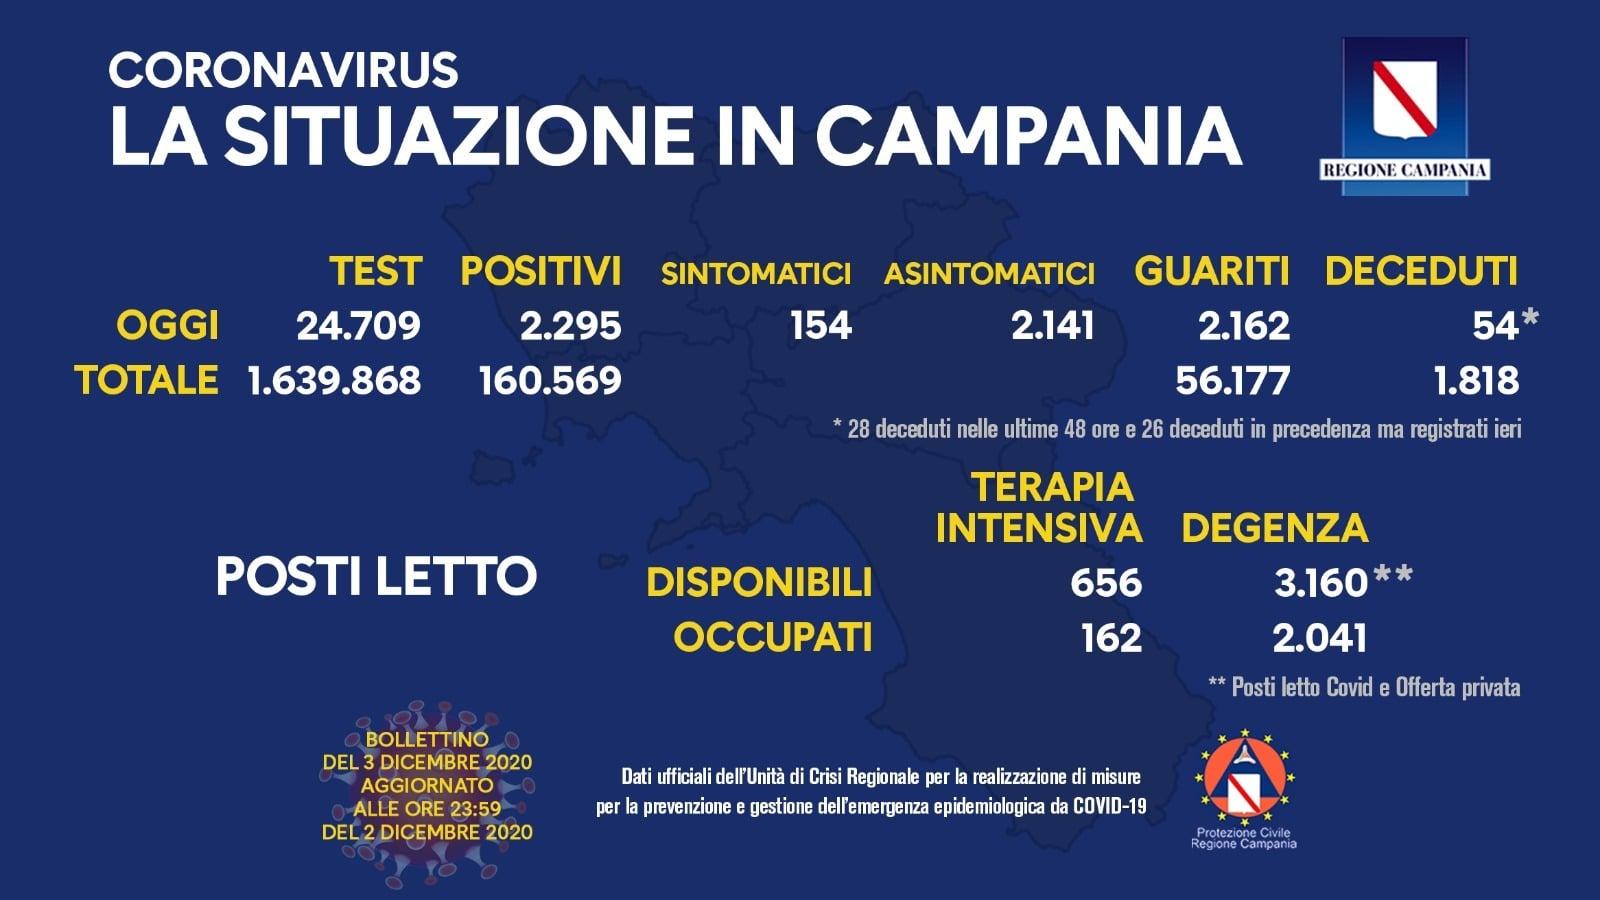 Covid Campania. 2295 nuovi positivi su 24.709 tamponi